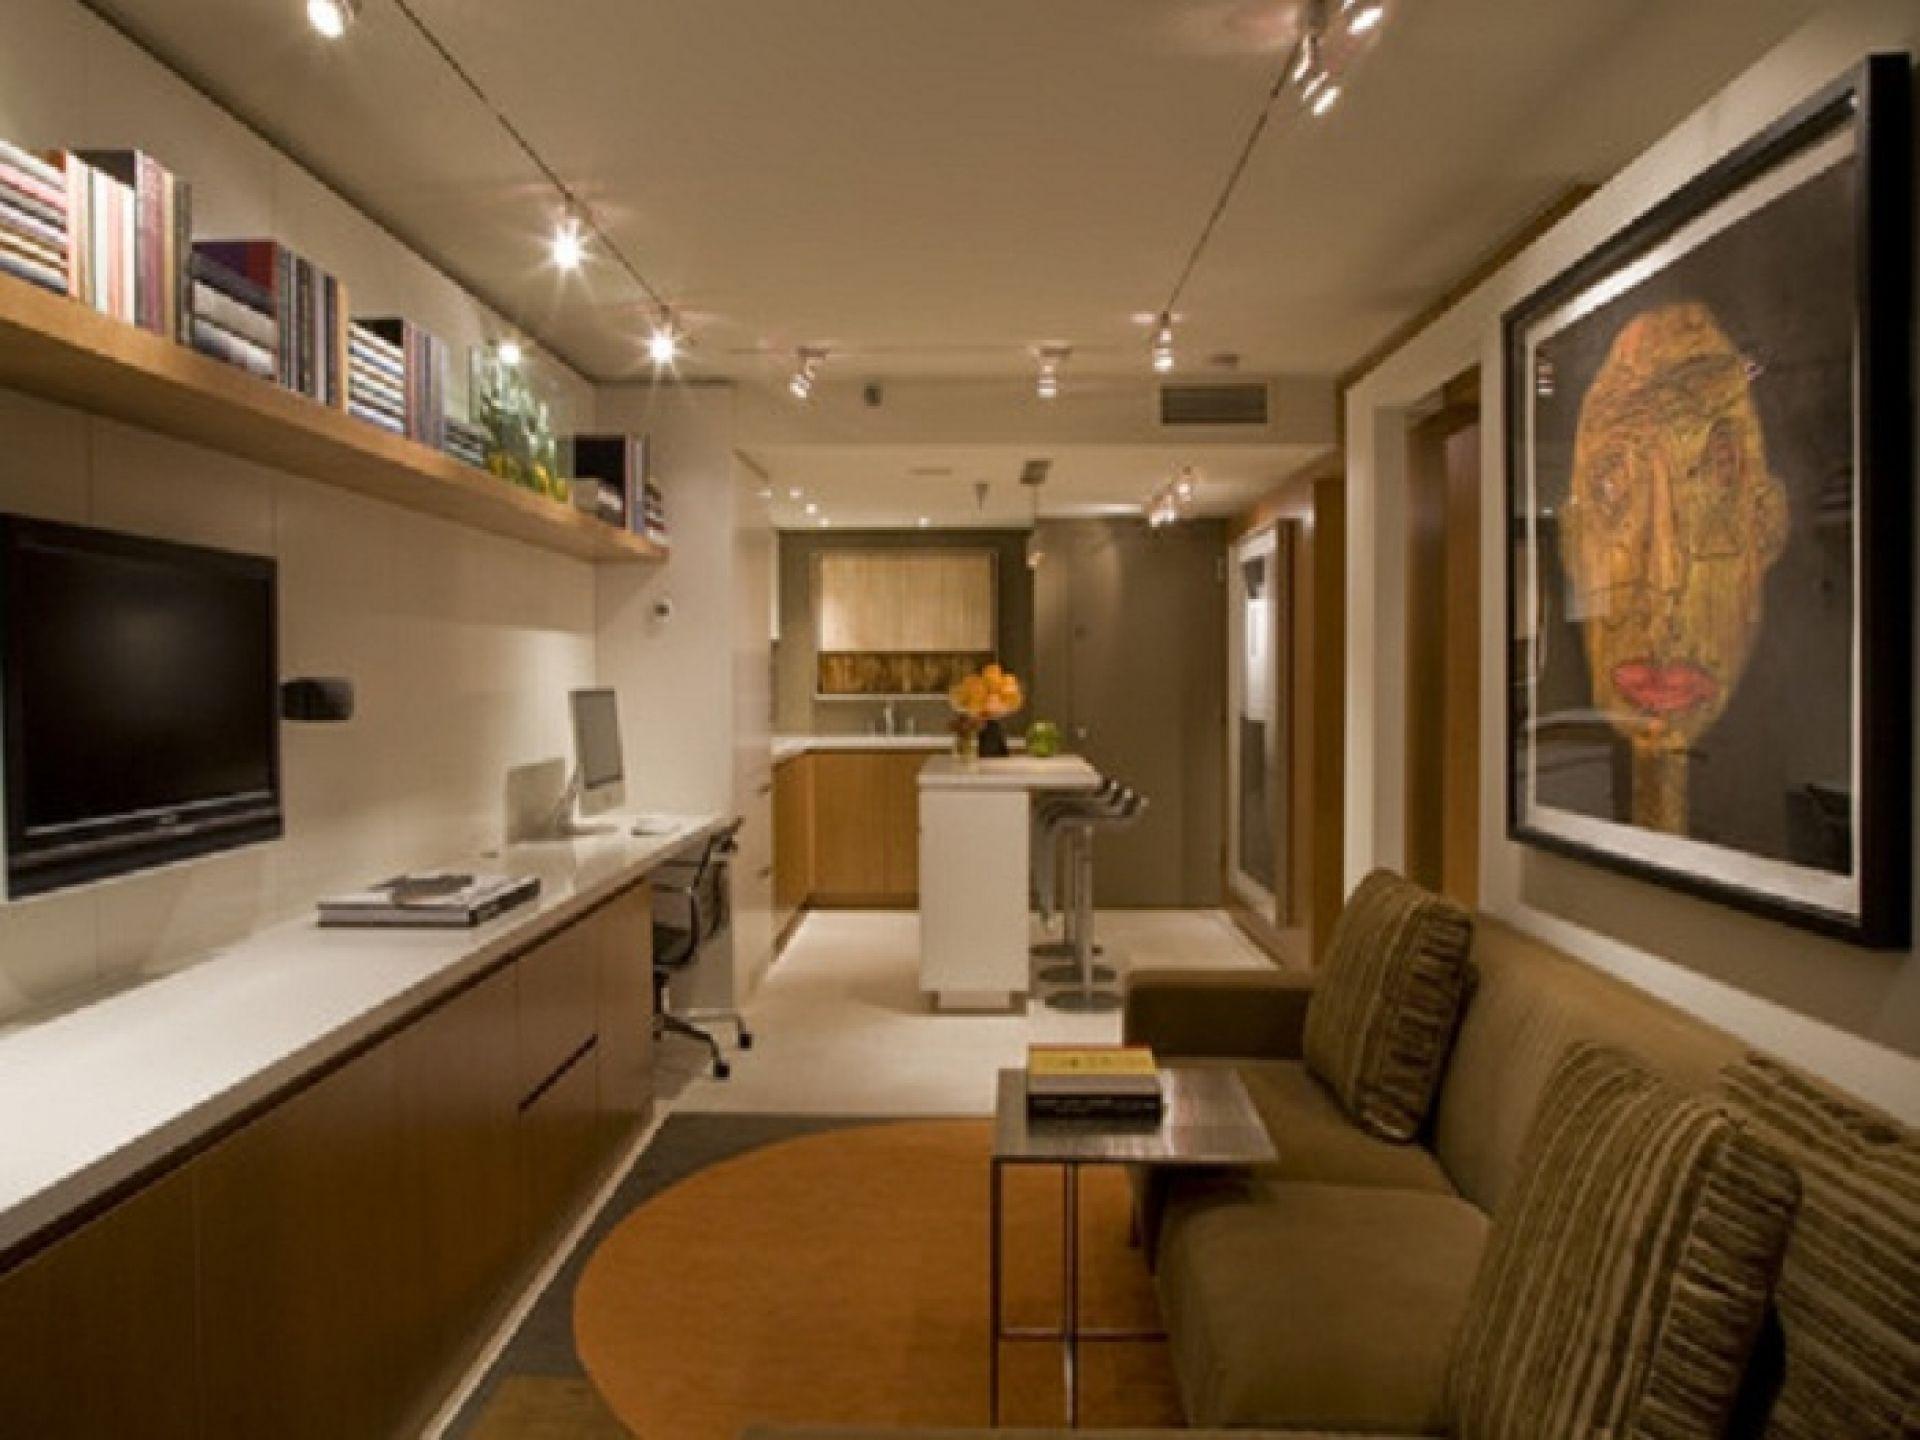 Long narrow basement design ideas decor catalogs party decorations decorating ideas gwcgiad fascinating